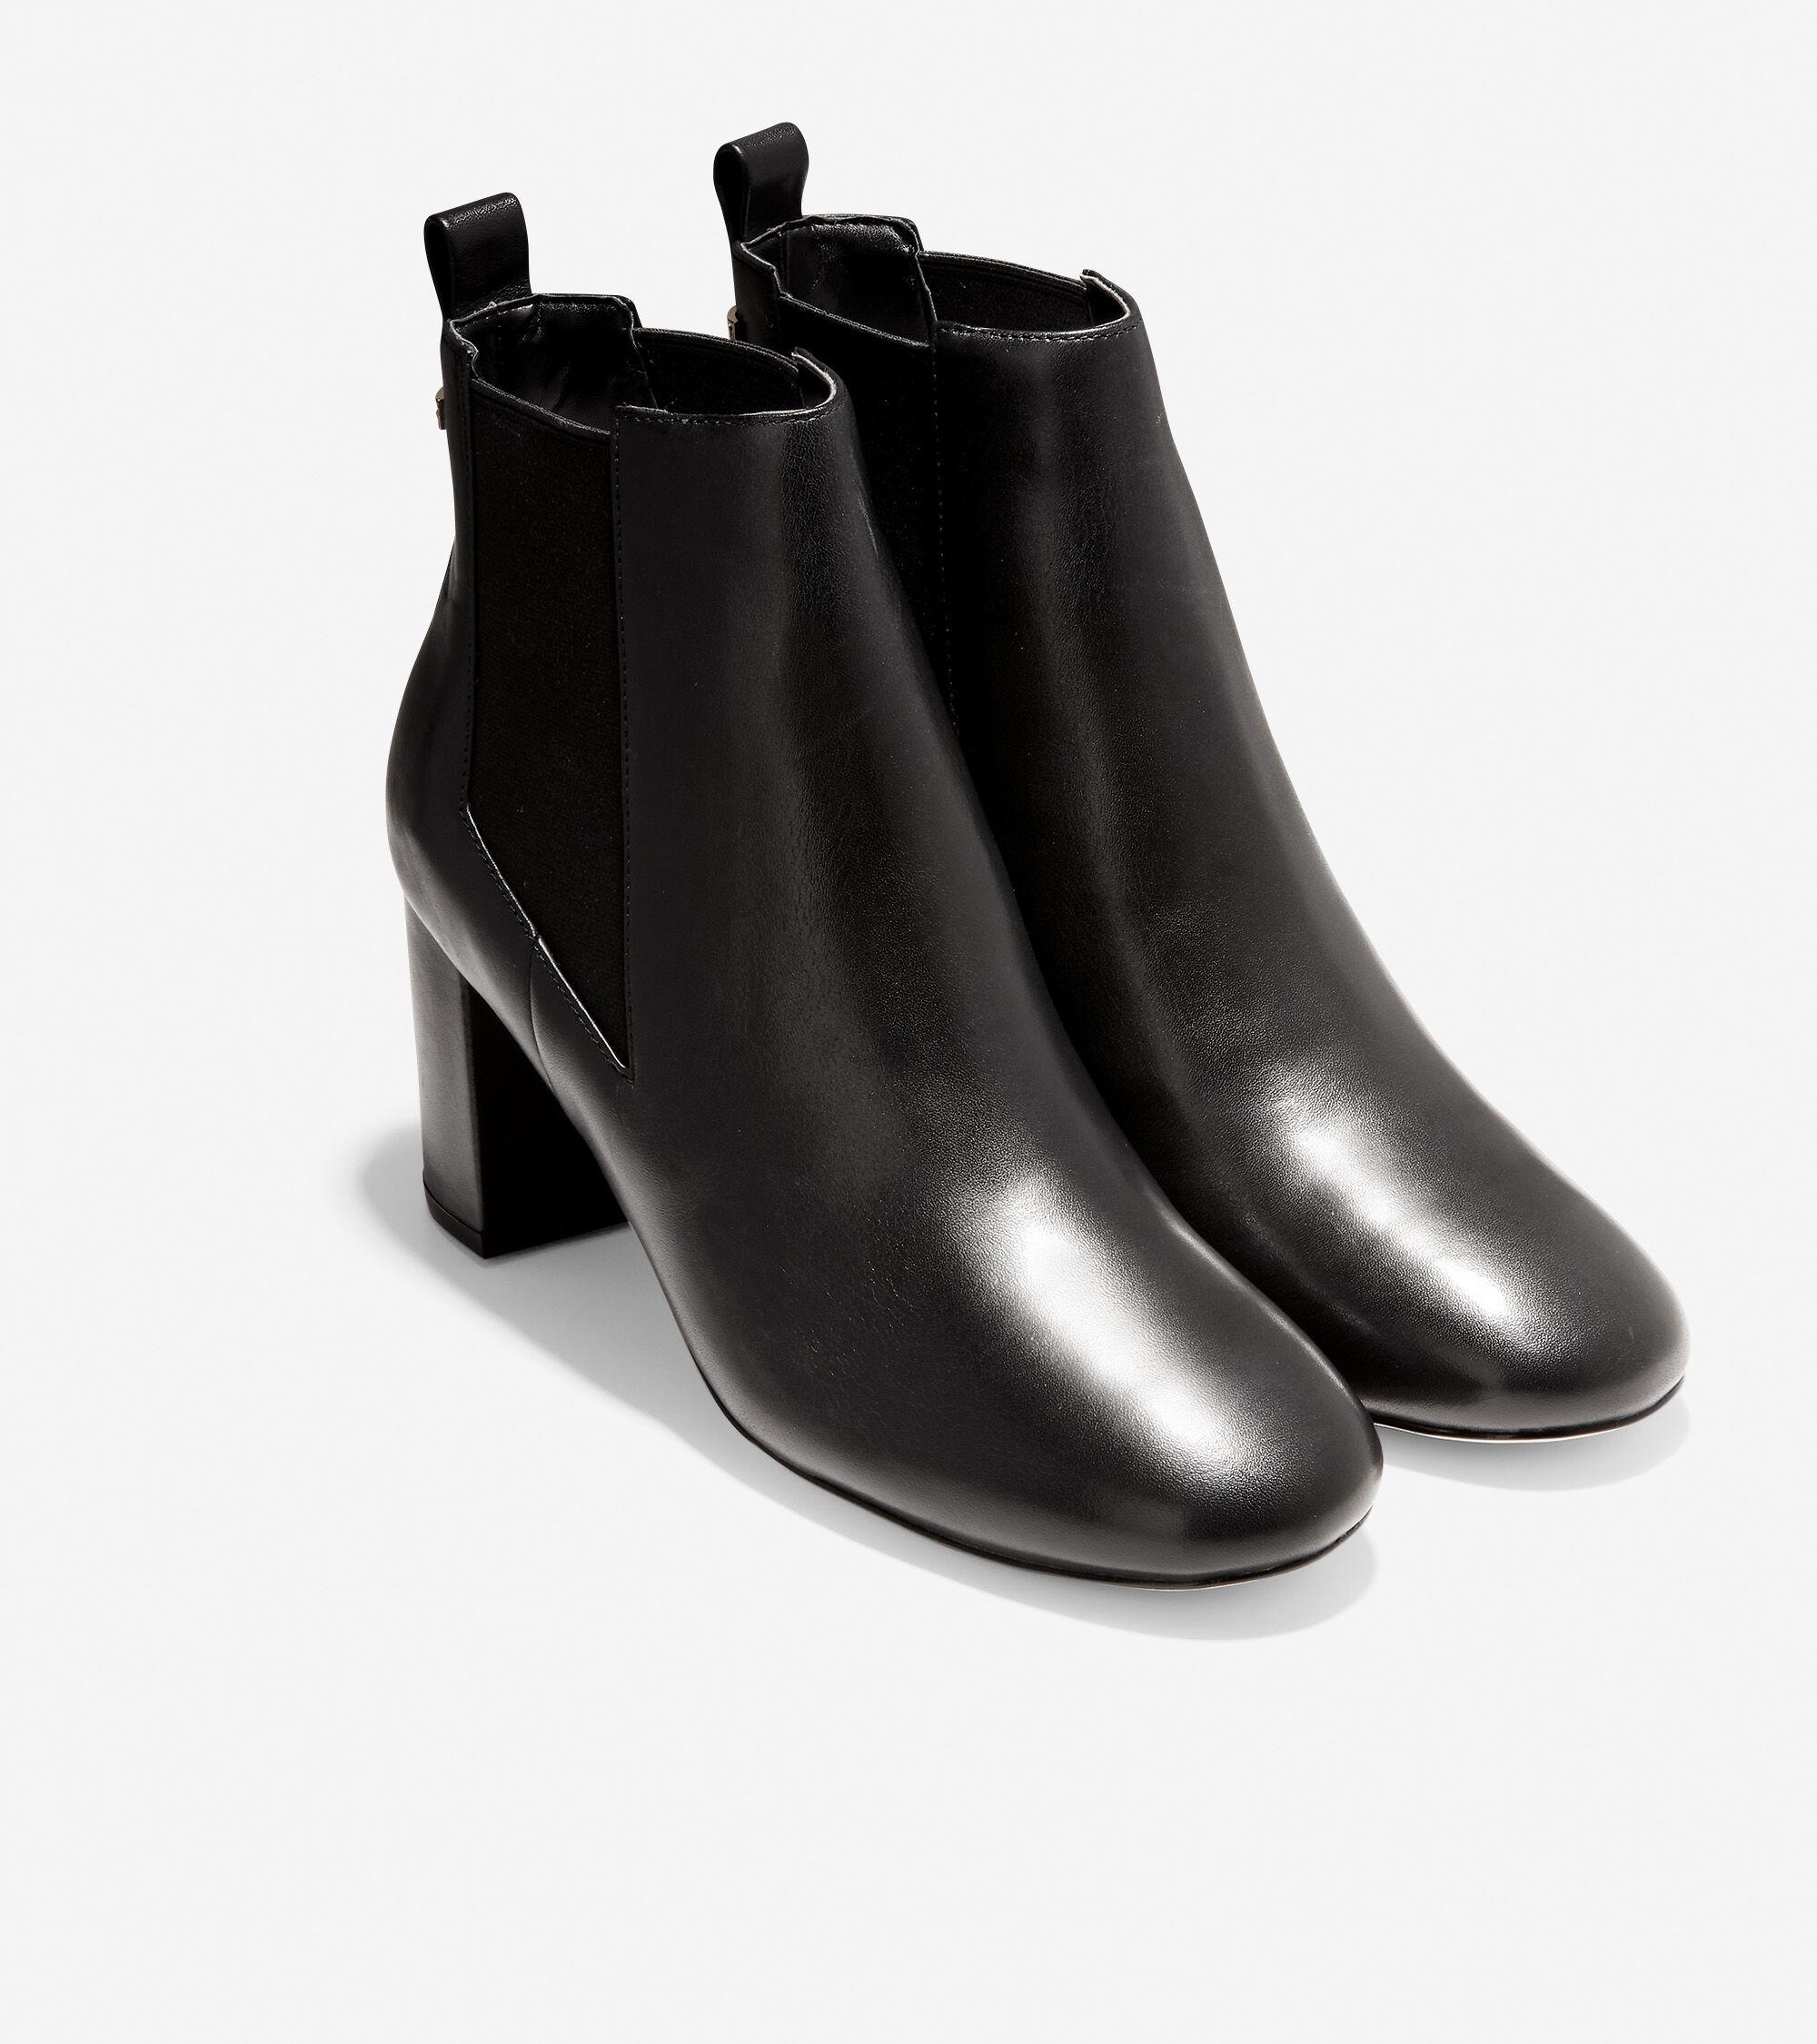 Nitasha Bootie (65mm) in Black Leather